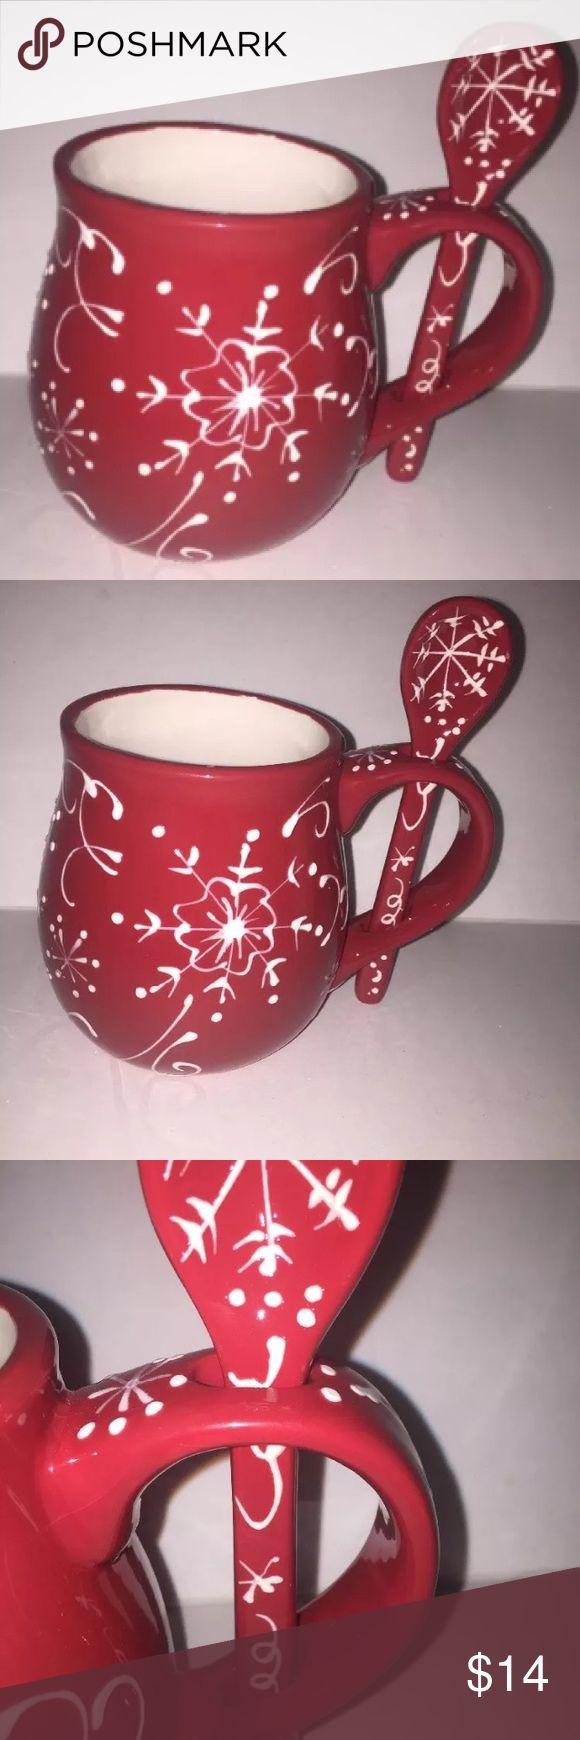 Cracker Barrel Christmas mug with Spoon🎄🎄🎄🎄 Cracker Barrel Christmas 🎄 mug with Spoon red and white gorgeous cracker barrel Other